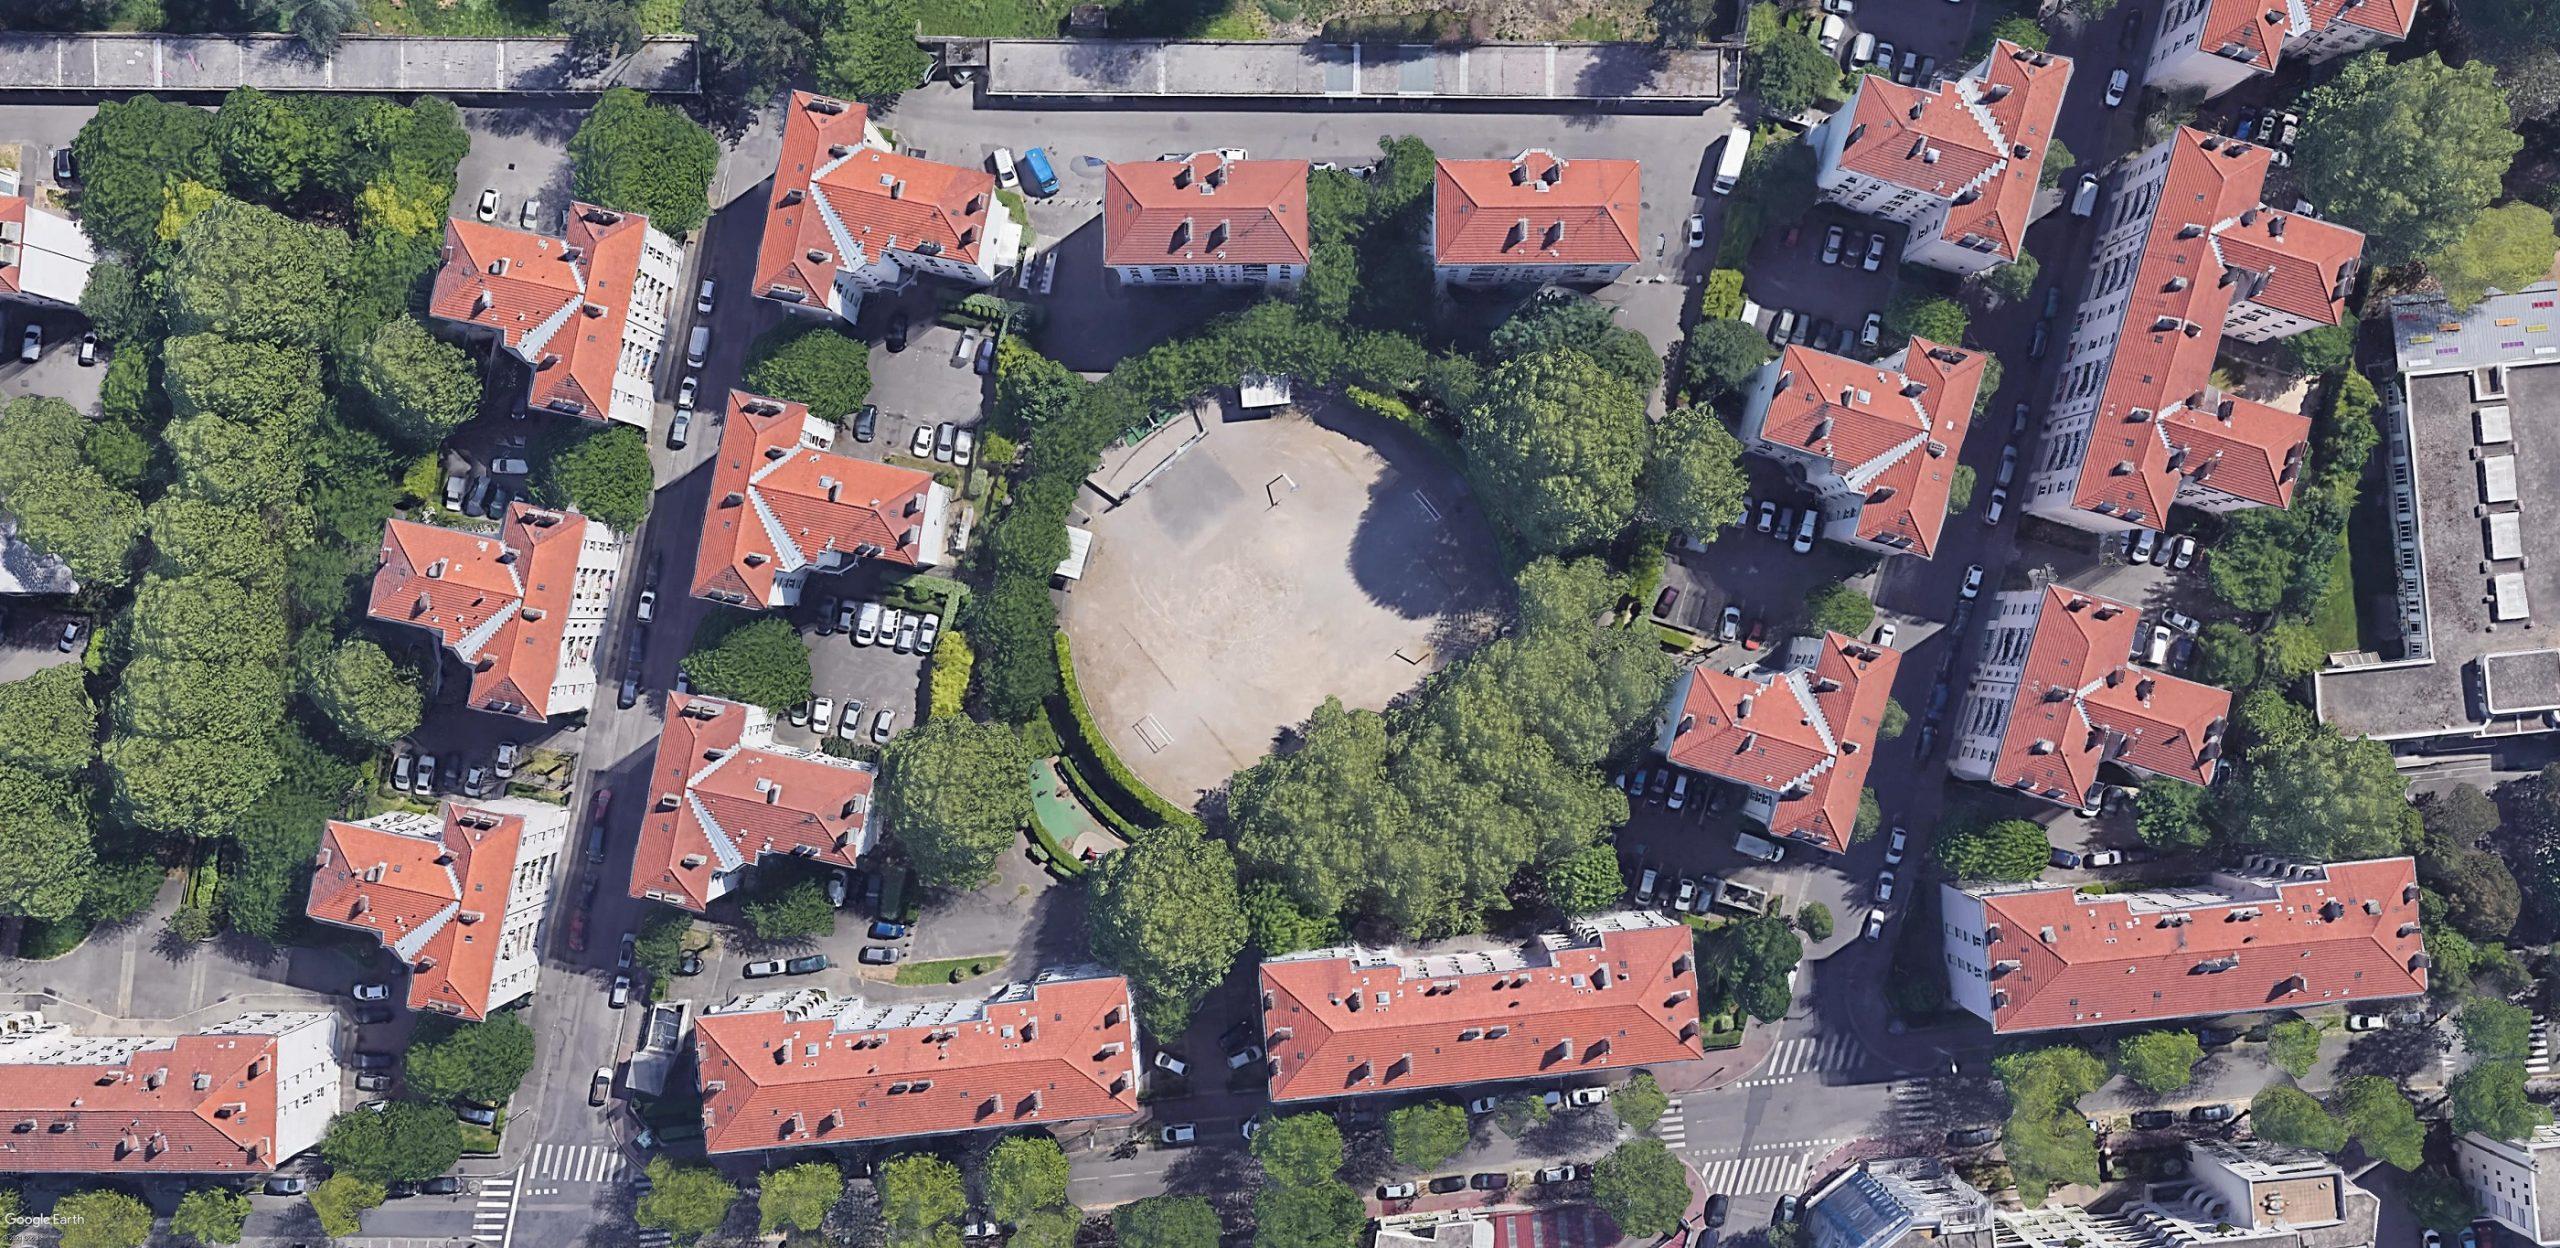 4-Cites jardins de Gerland